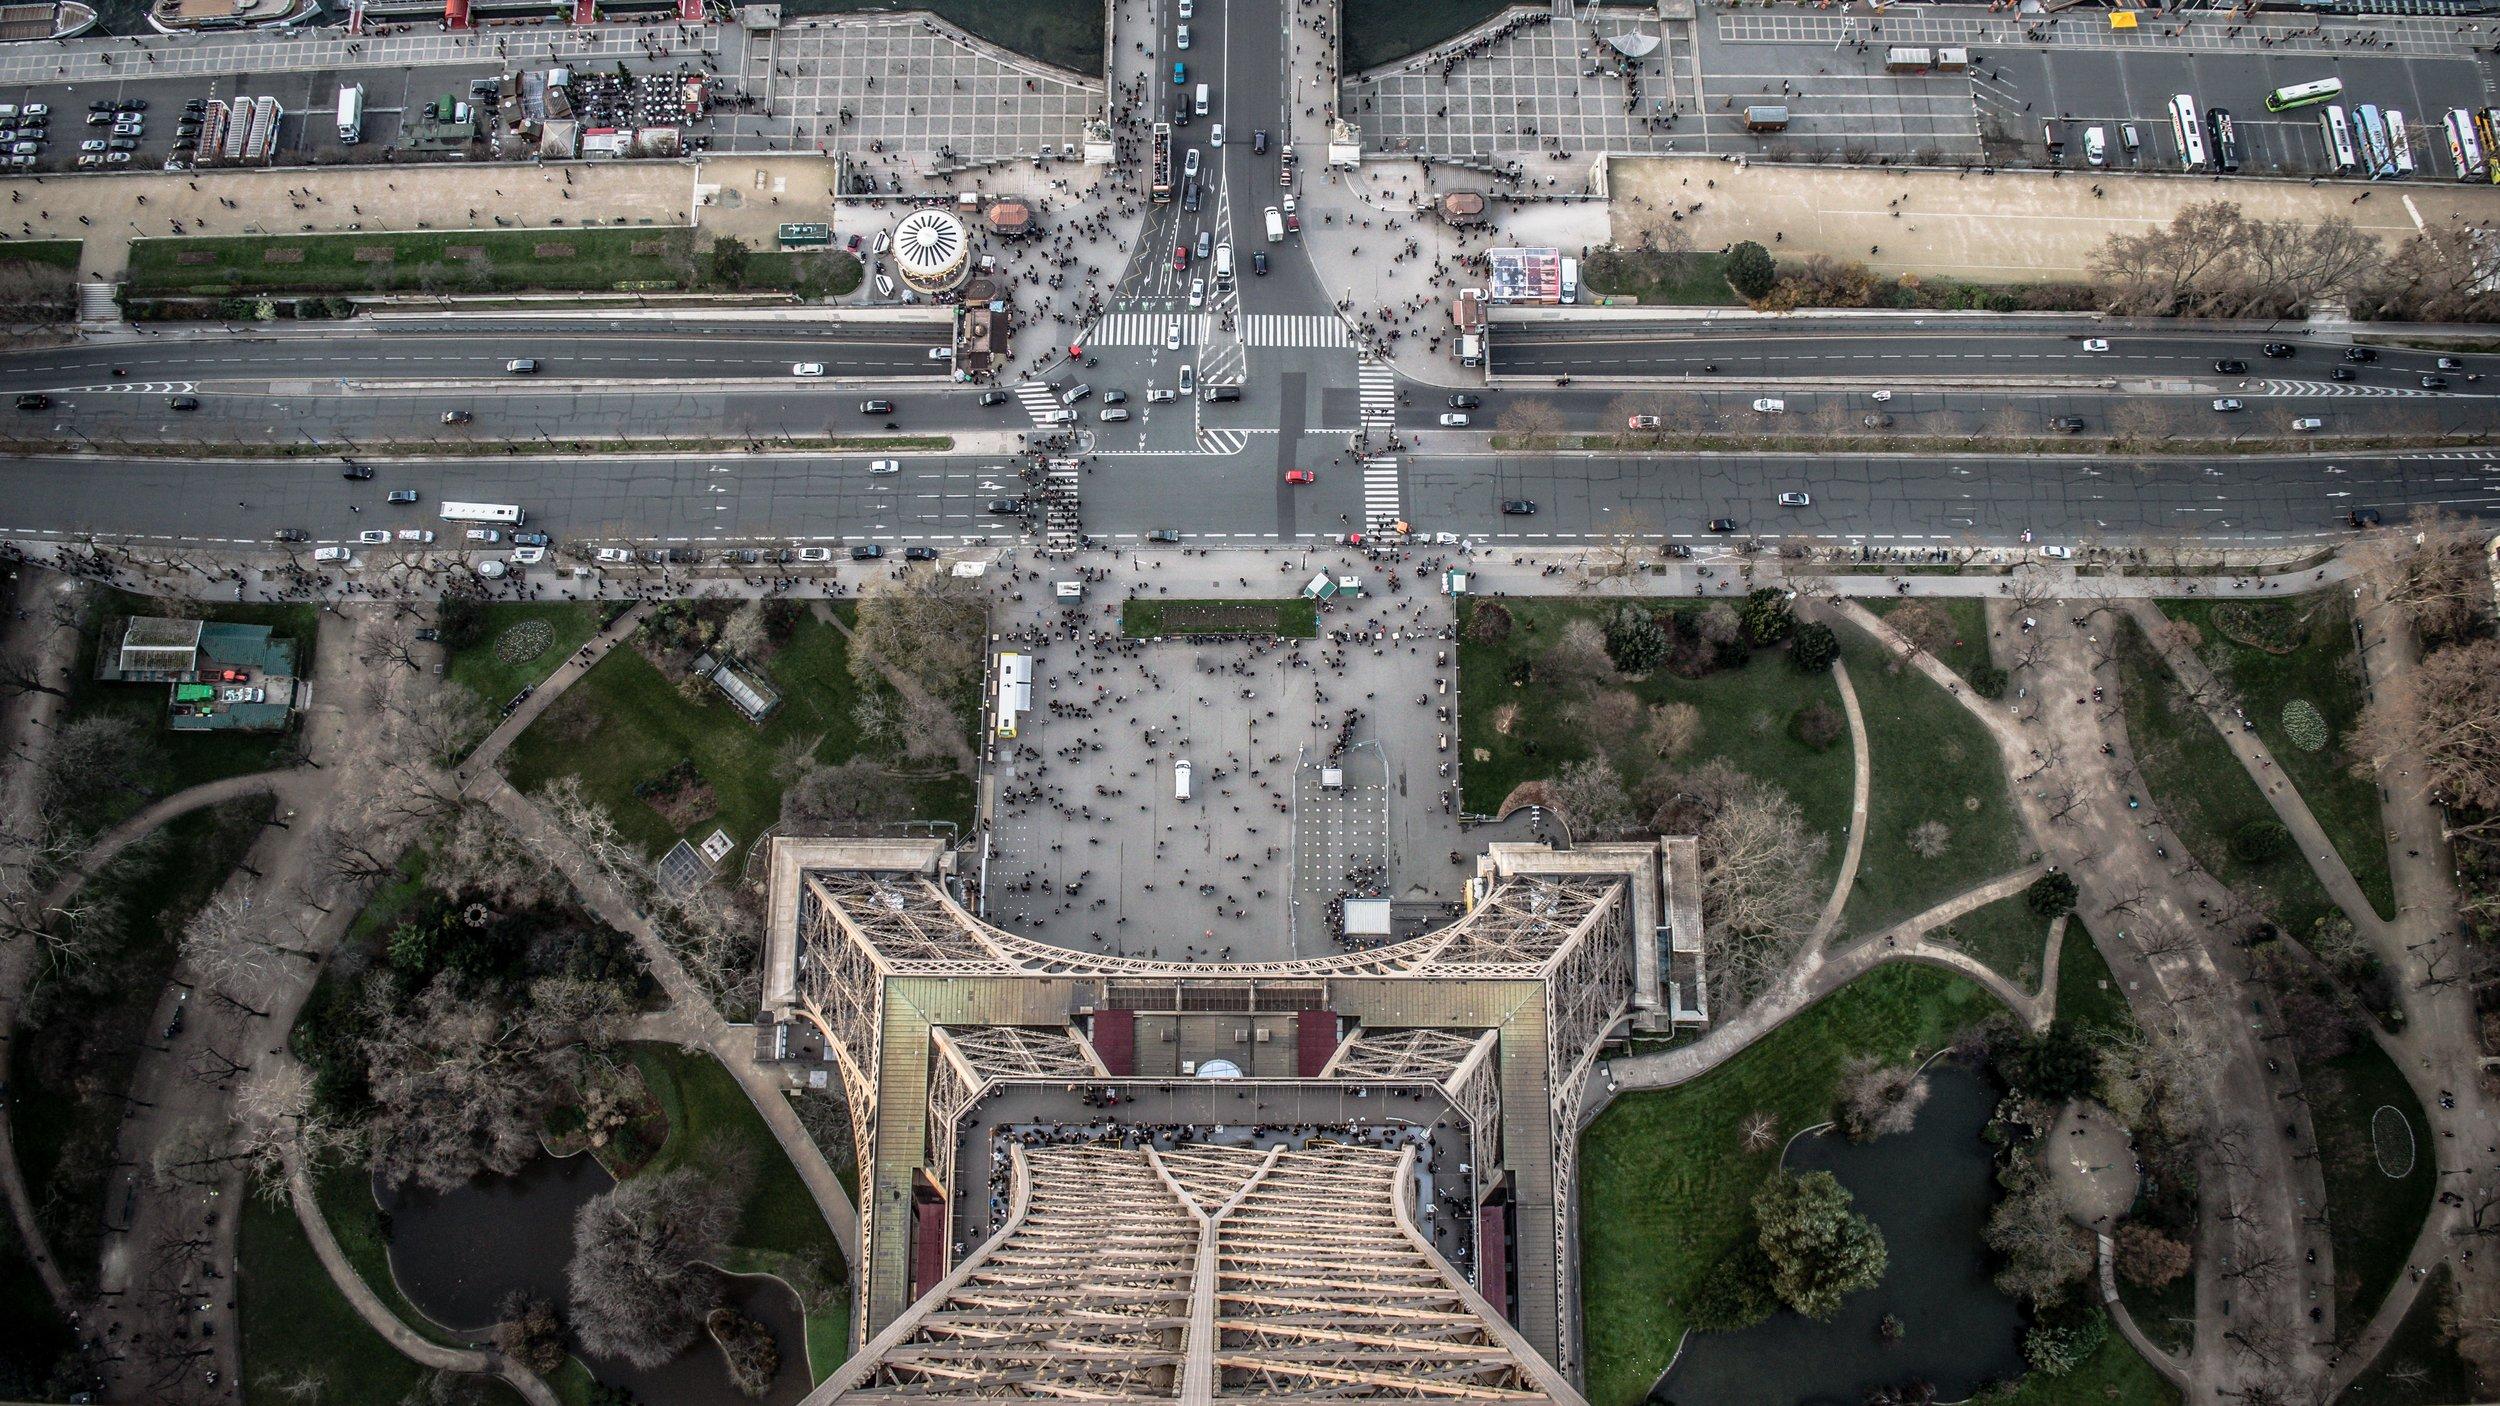 Eiffel Tower Looking Down